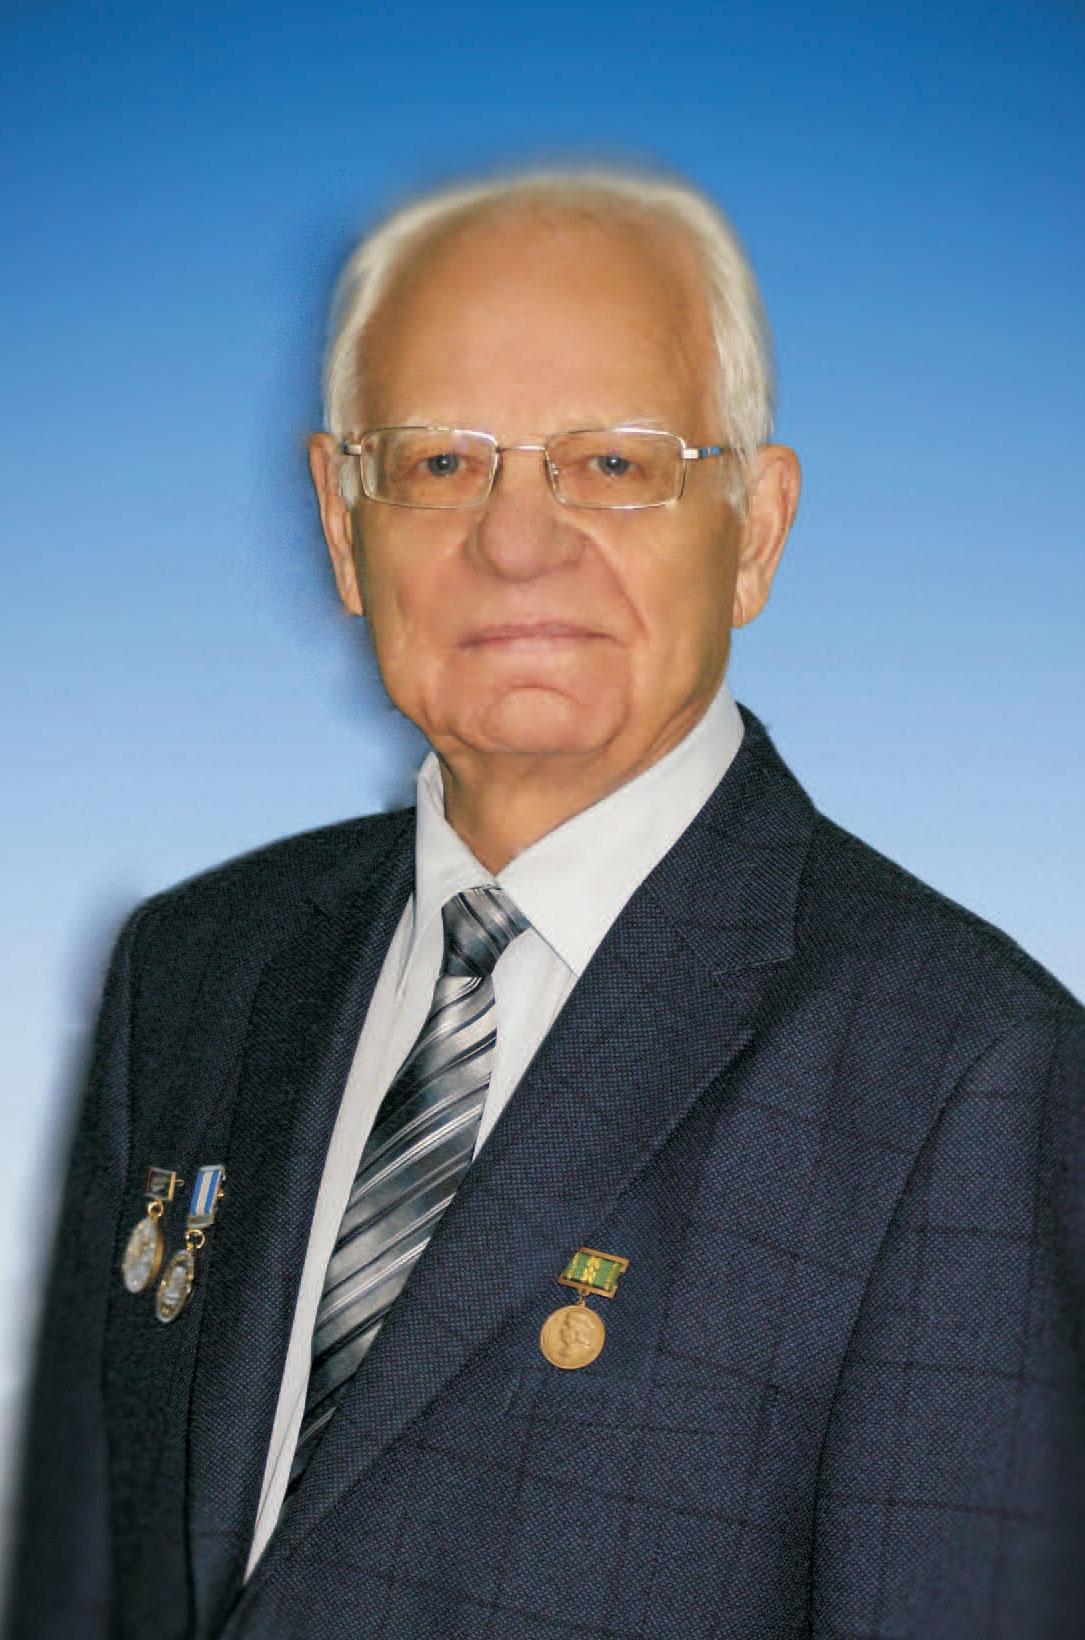 Дзмітрачкоў Пётр Фролавіч